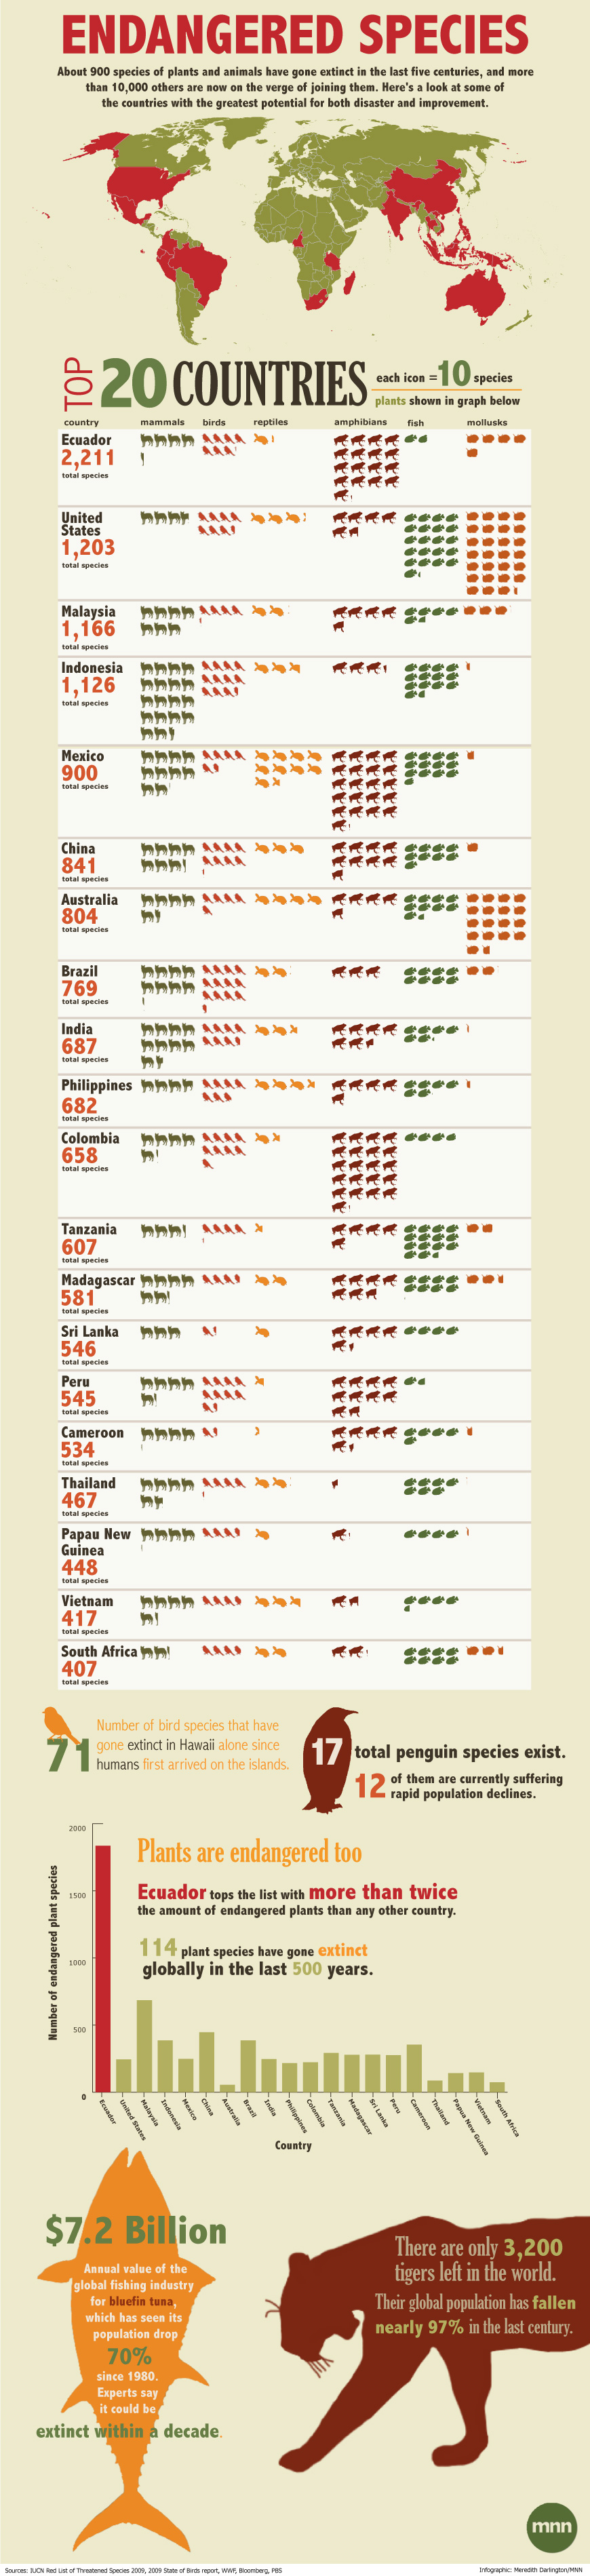 Endangered Species Infographic